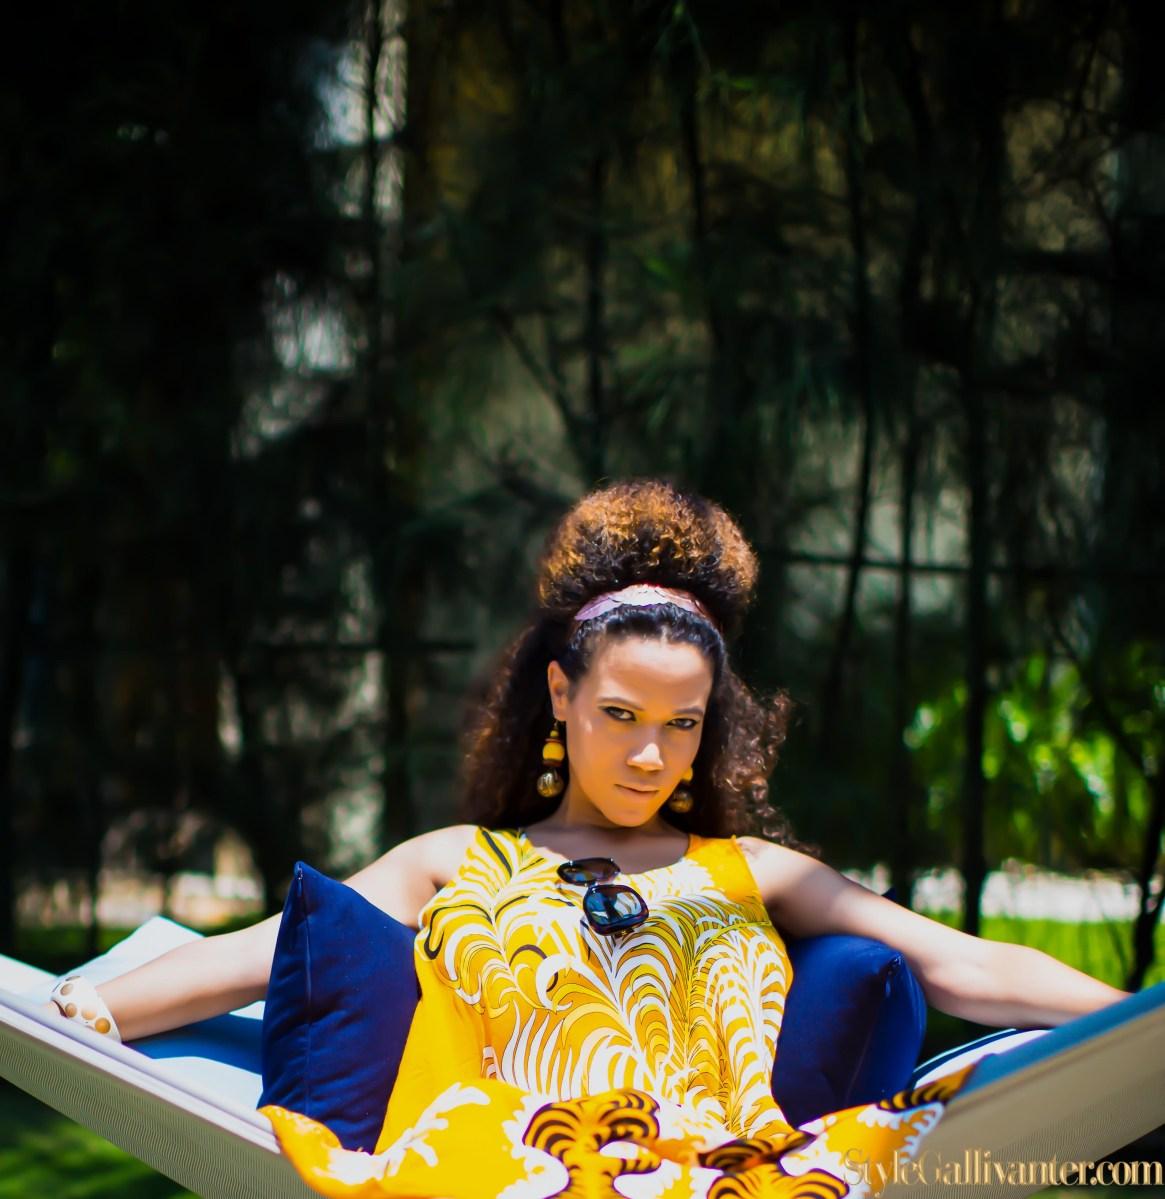 stylegallivanter.com_sakhino_best-fashion-style-blogs-melbourne-australia_beautiful-natural-hair-bloggers_top-african-fashion-blogs_best-natural-hair-blogs-australia_most-stylish-fashion-bloggers-australia-botswana-26